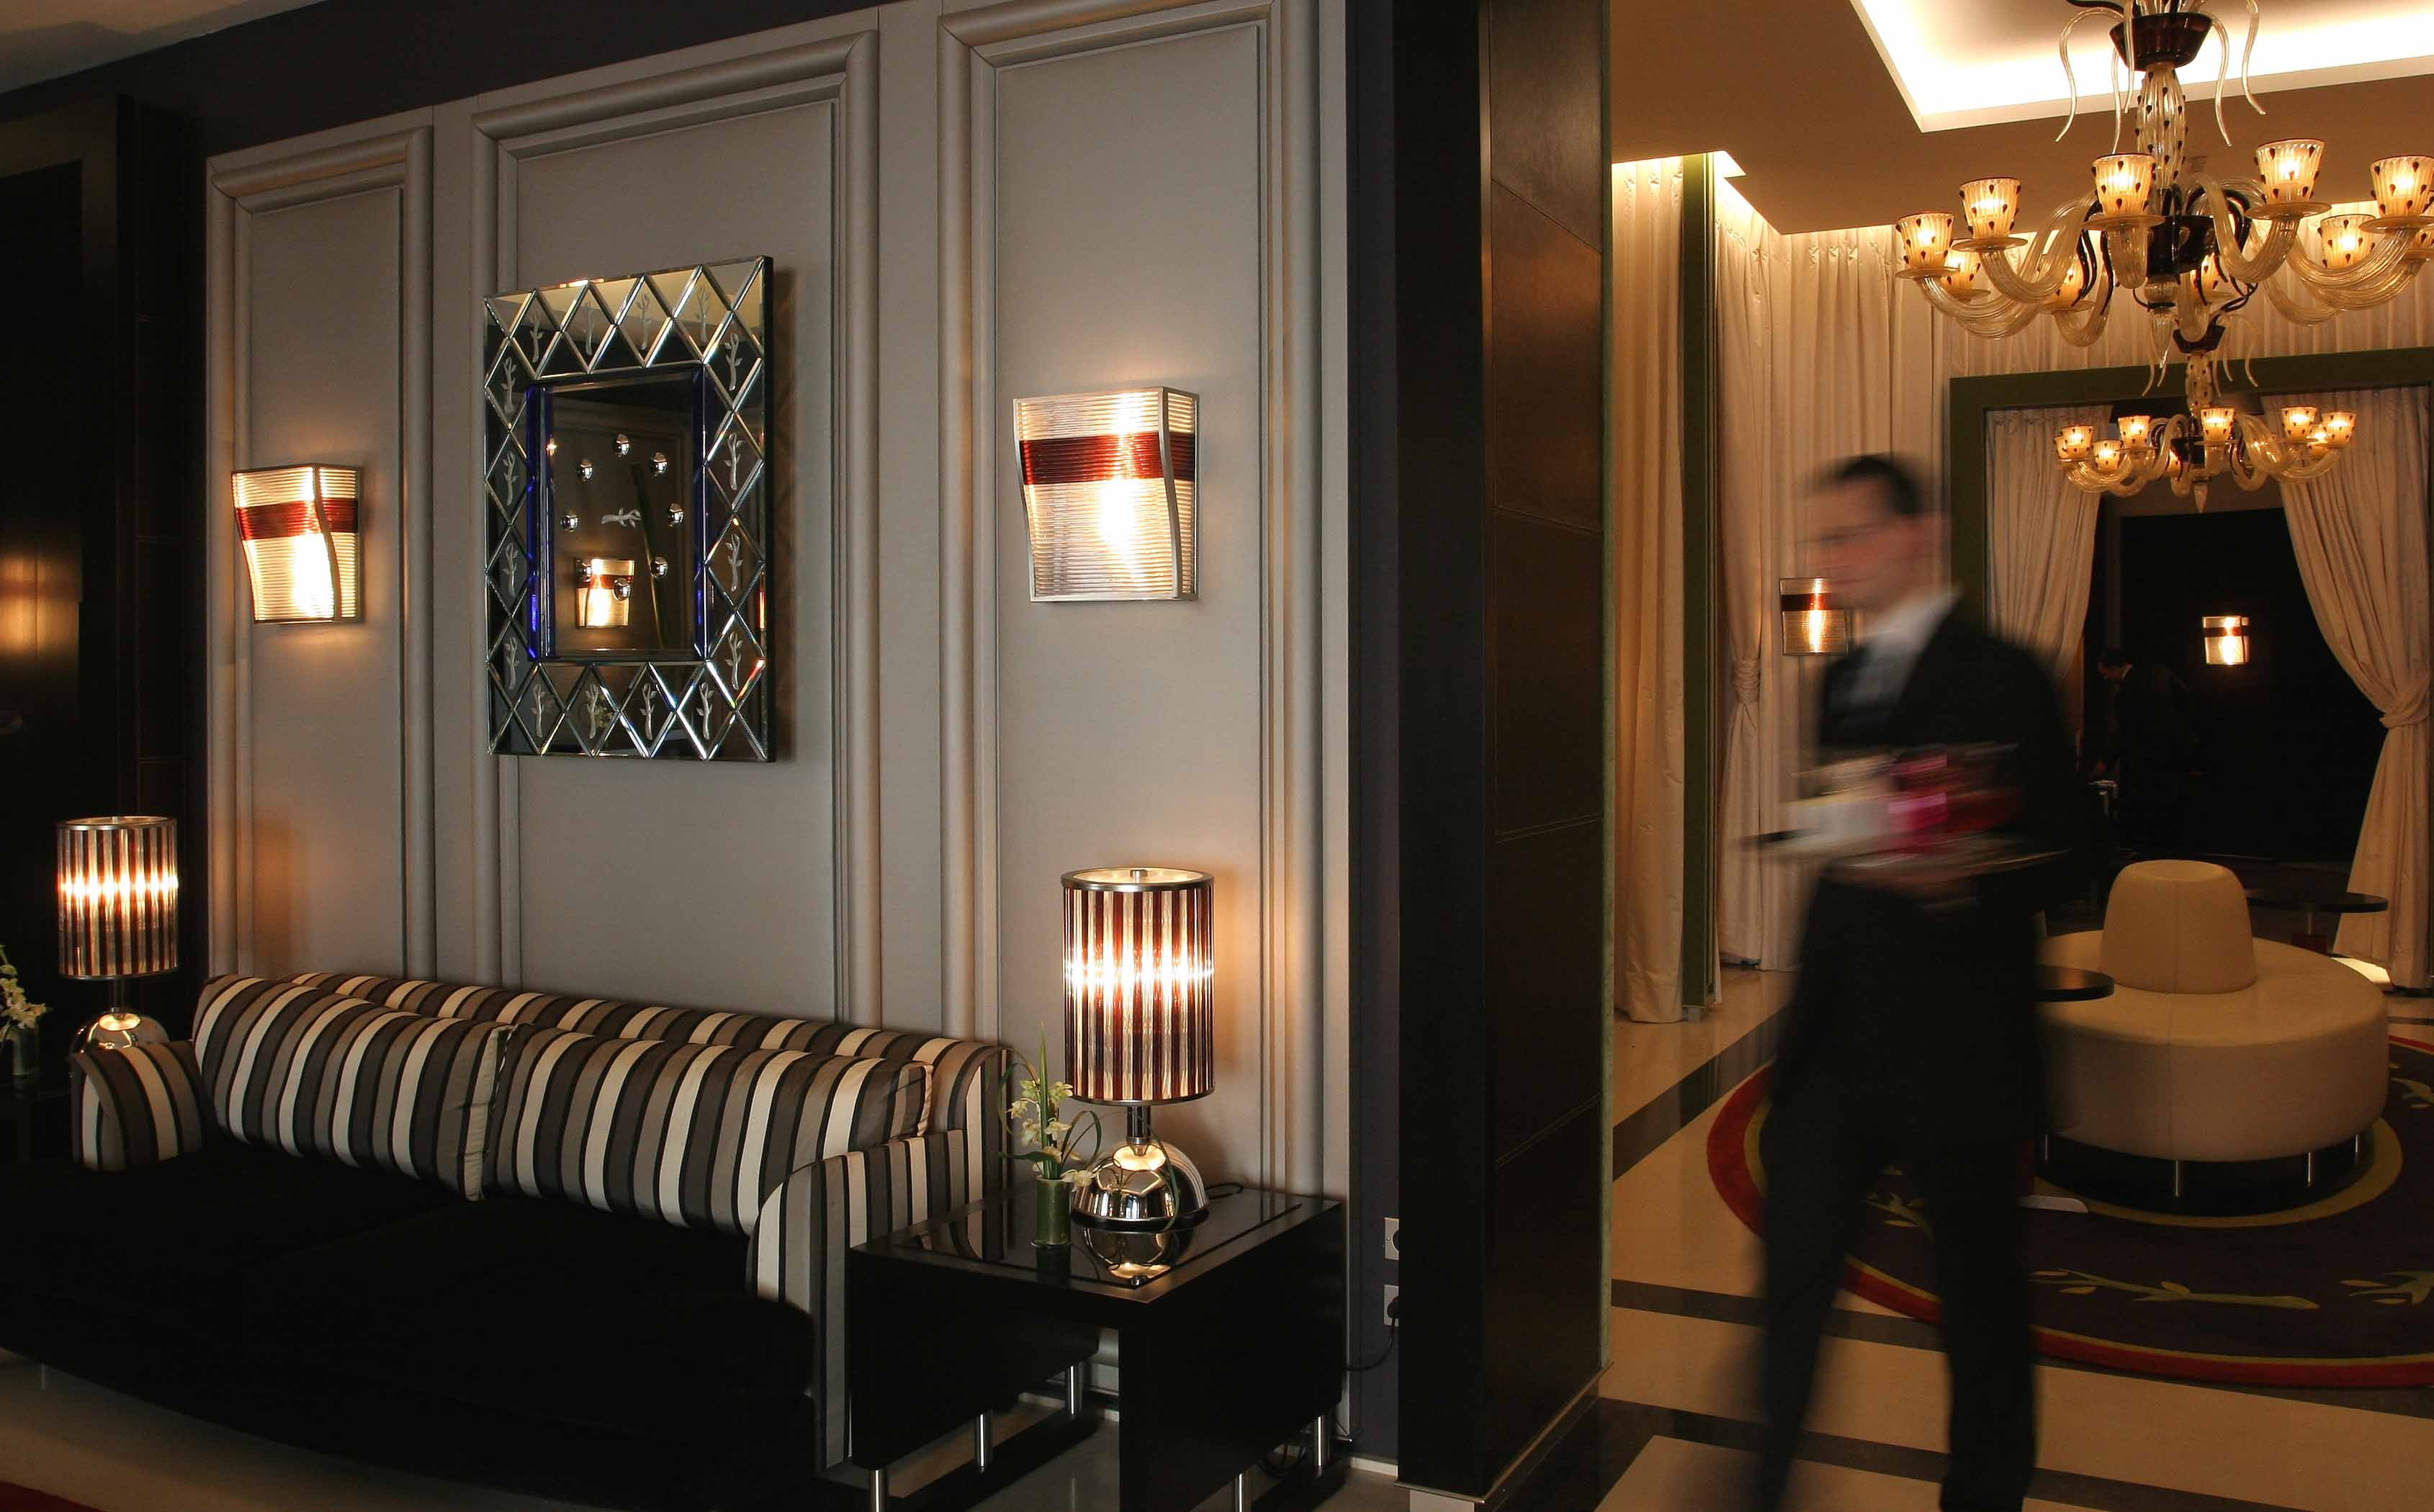 marignan-hotel-olivier-gagnere-veronese-3